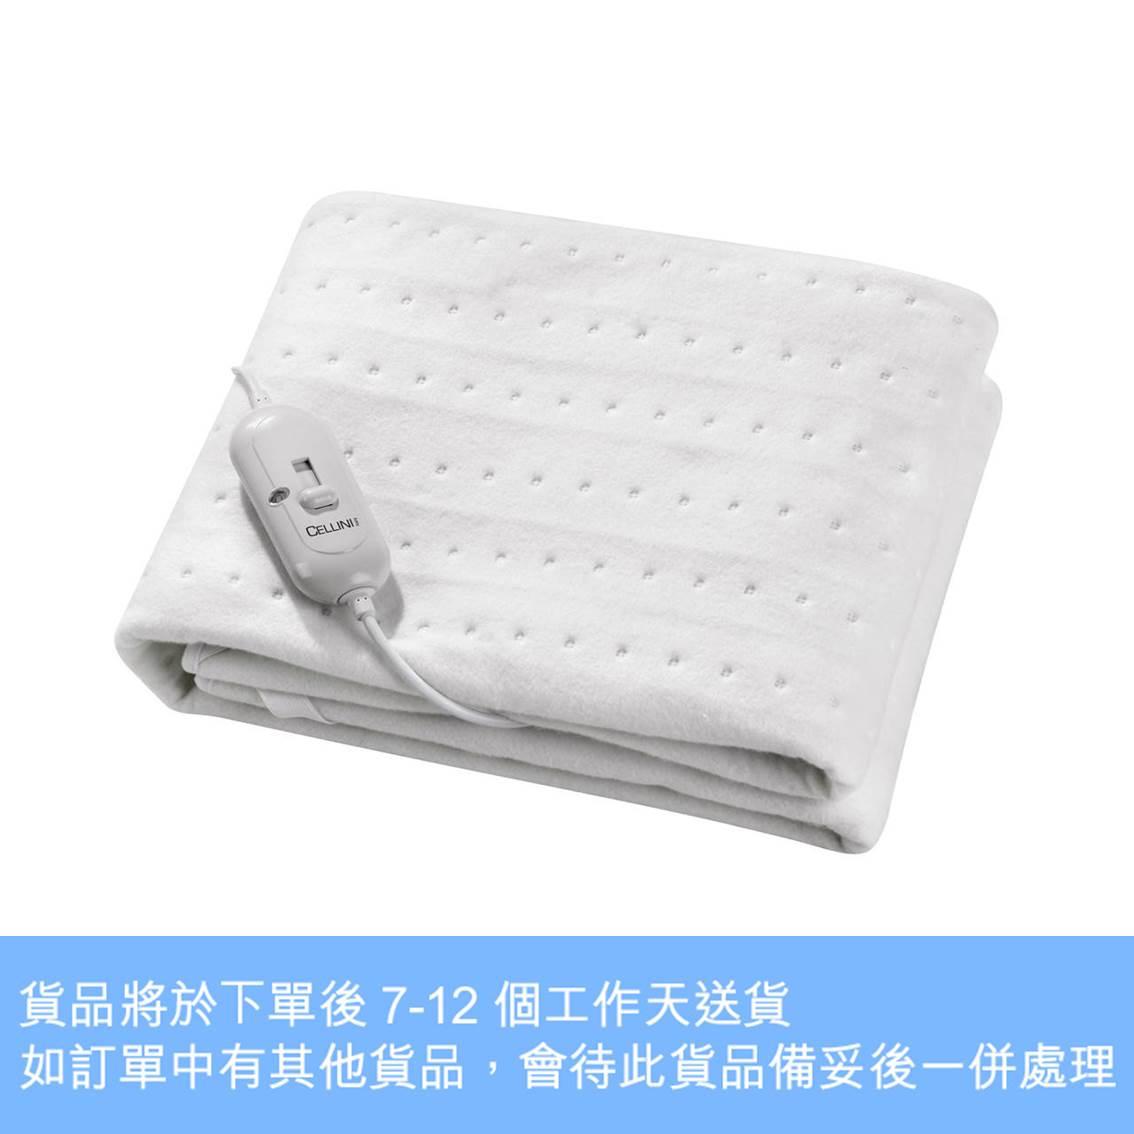 GEMINI單人電暖毯(可手洗/機洗)-型號 :GEB12W